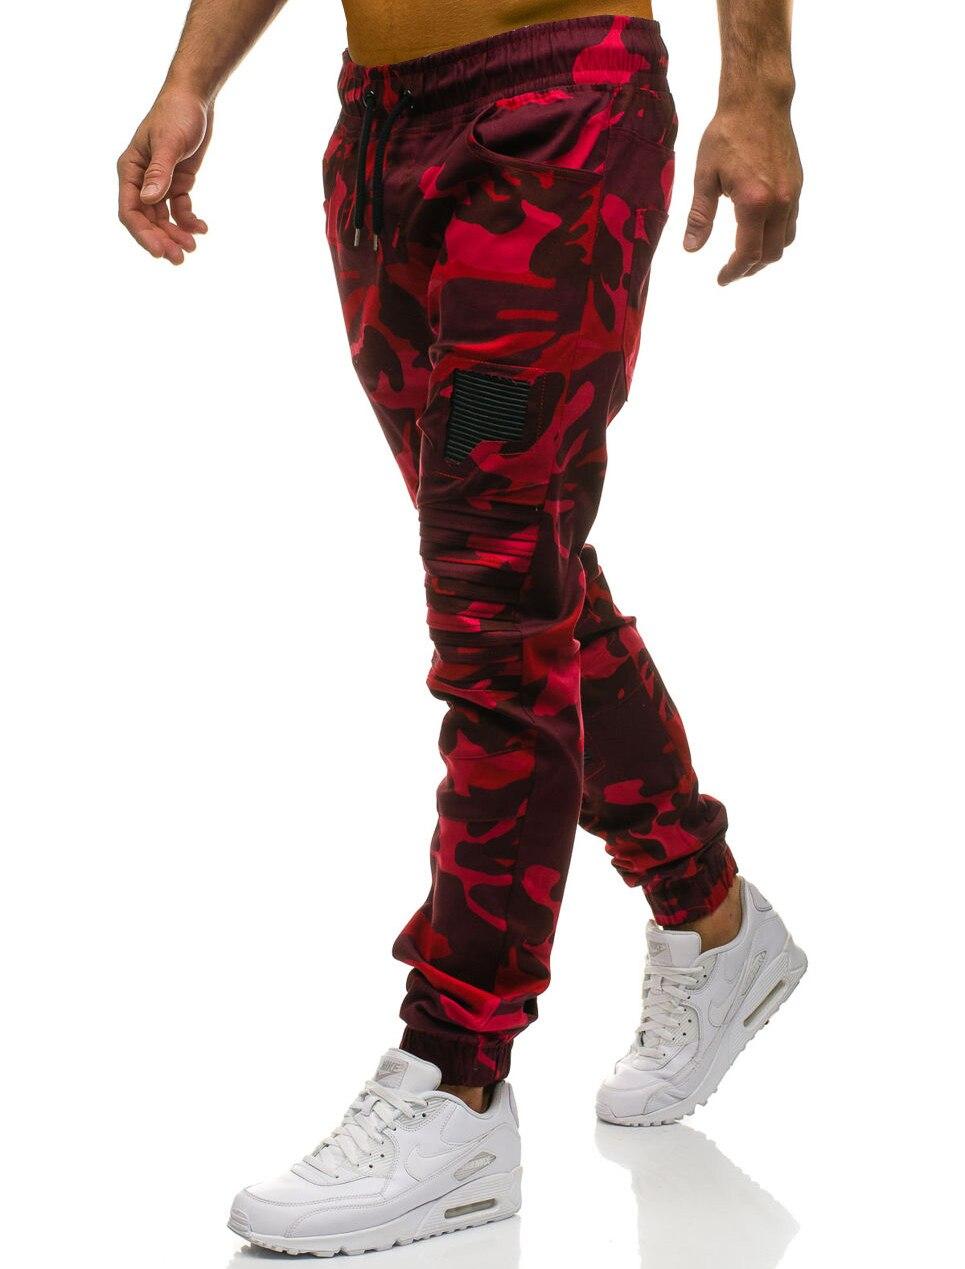 Men Sweatpants Casual Pants Slim fit Drawstring Sweatpants Slacks Elastic Waist Patchwork Pleated Ultrathin Male Trousers Jogger 18